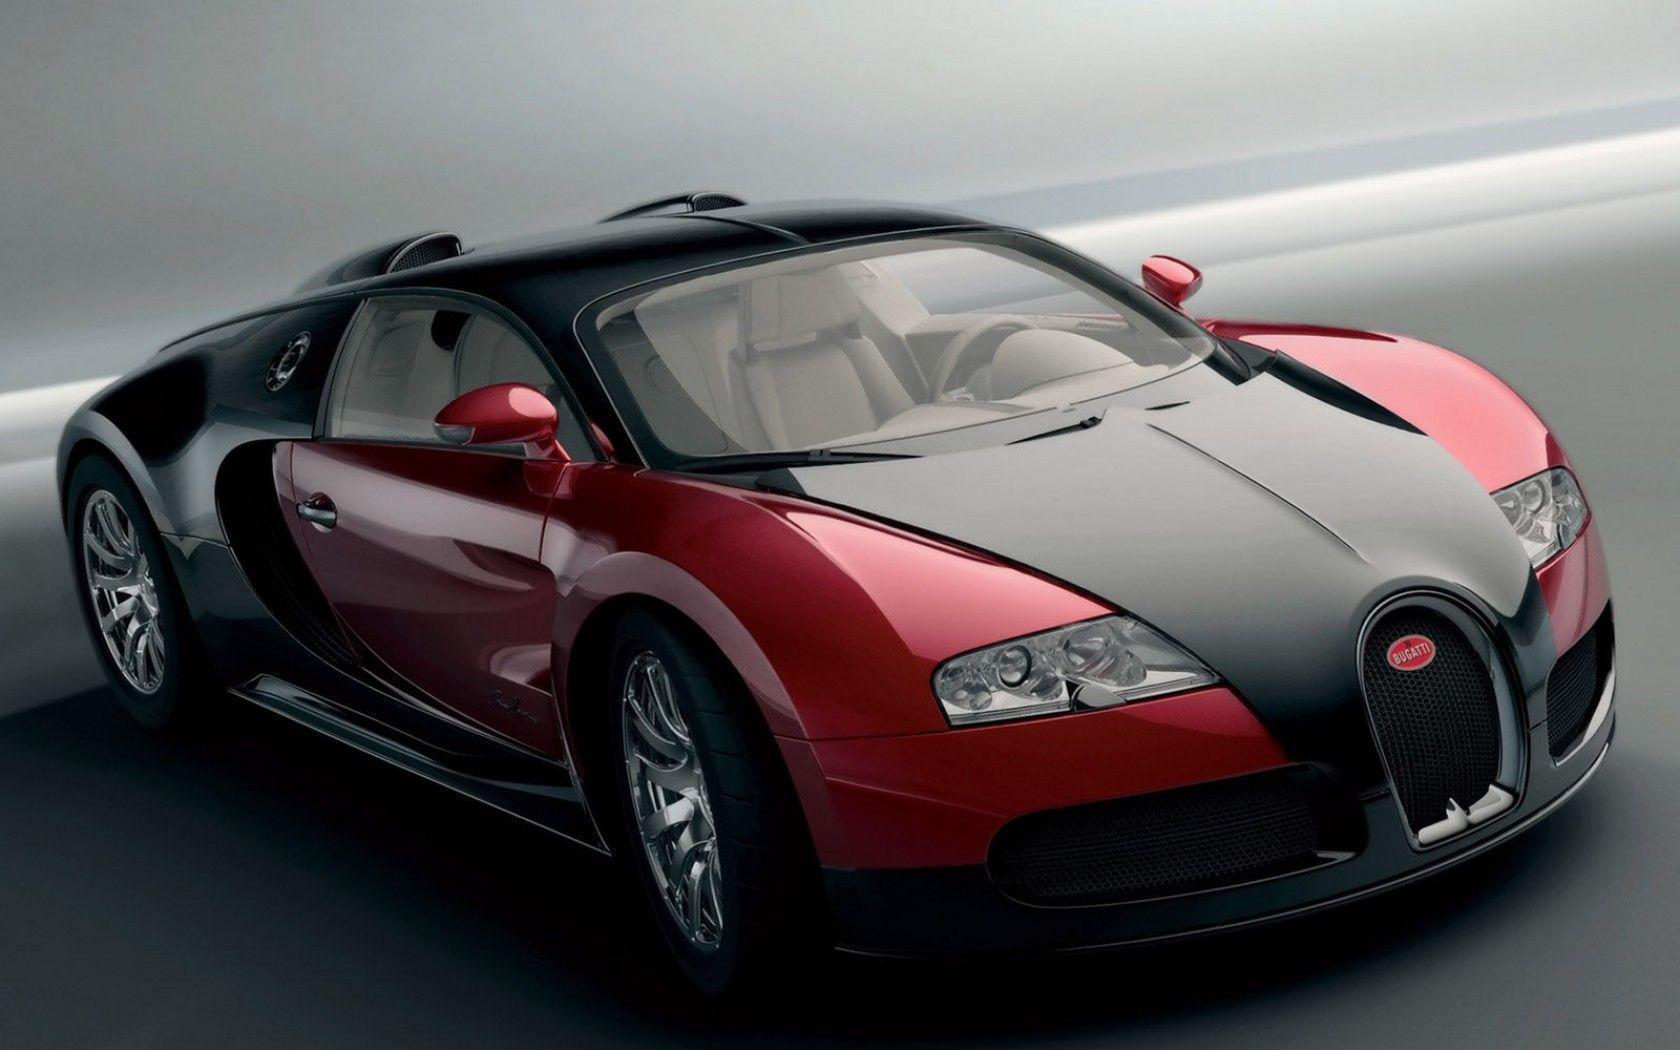 Black Bugatti Veyron Hd Wallpapers Top Free Black Bugatti Veyron Hd Backgrounds Wallpaperaccess